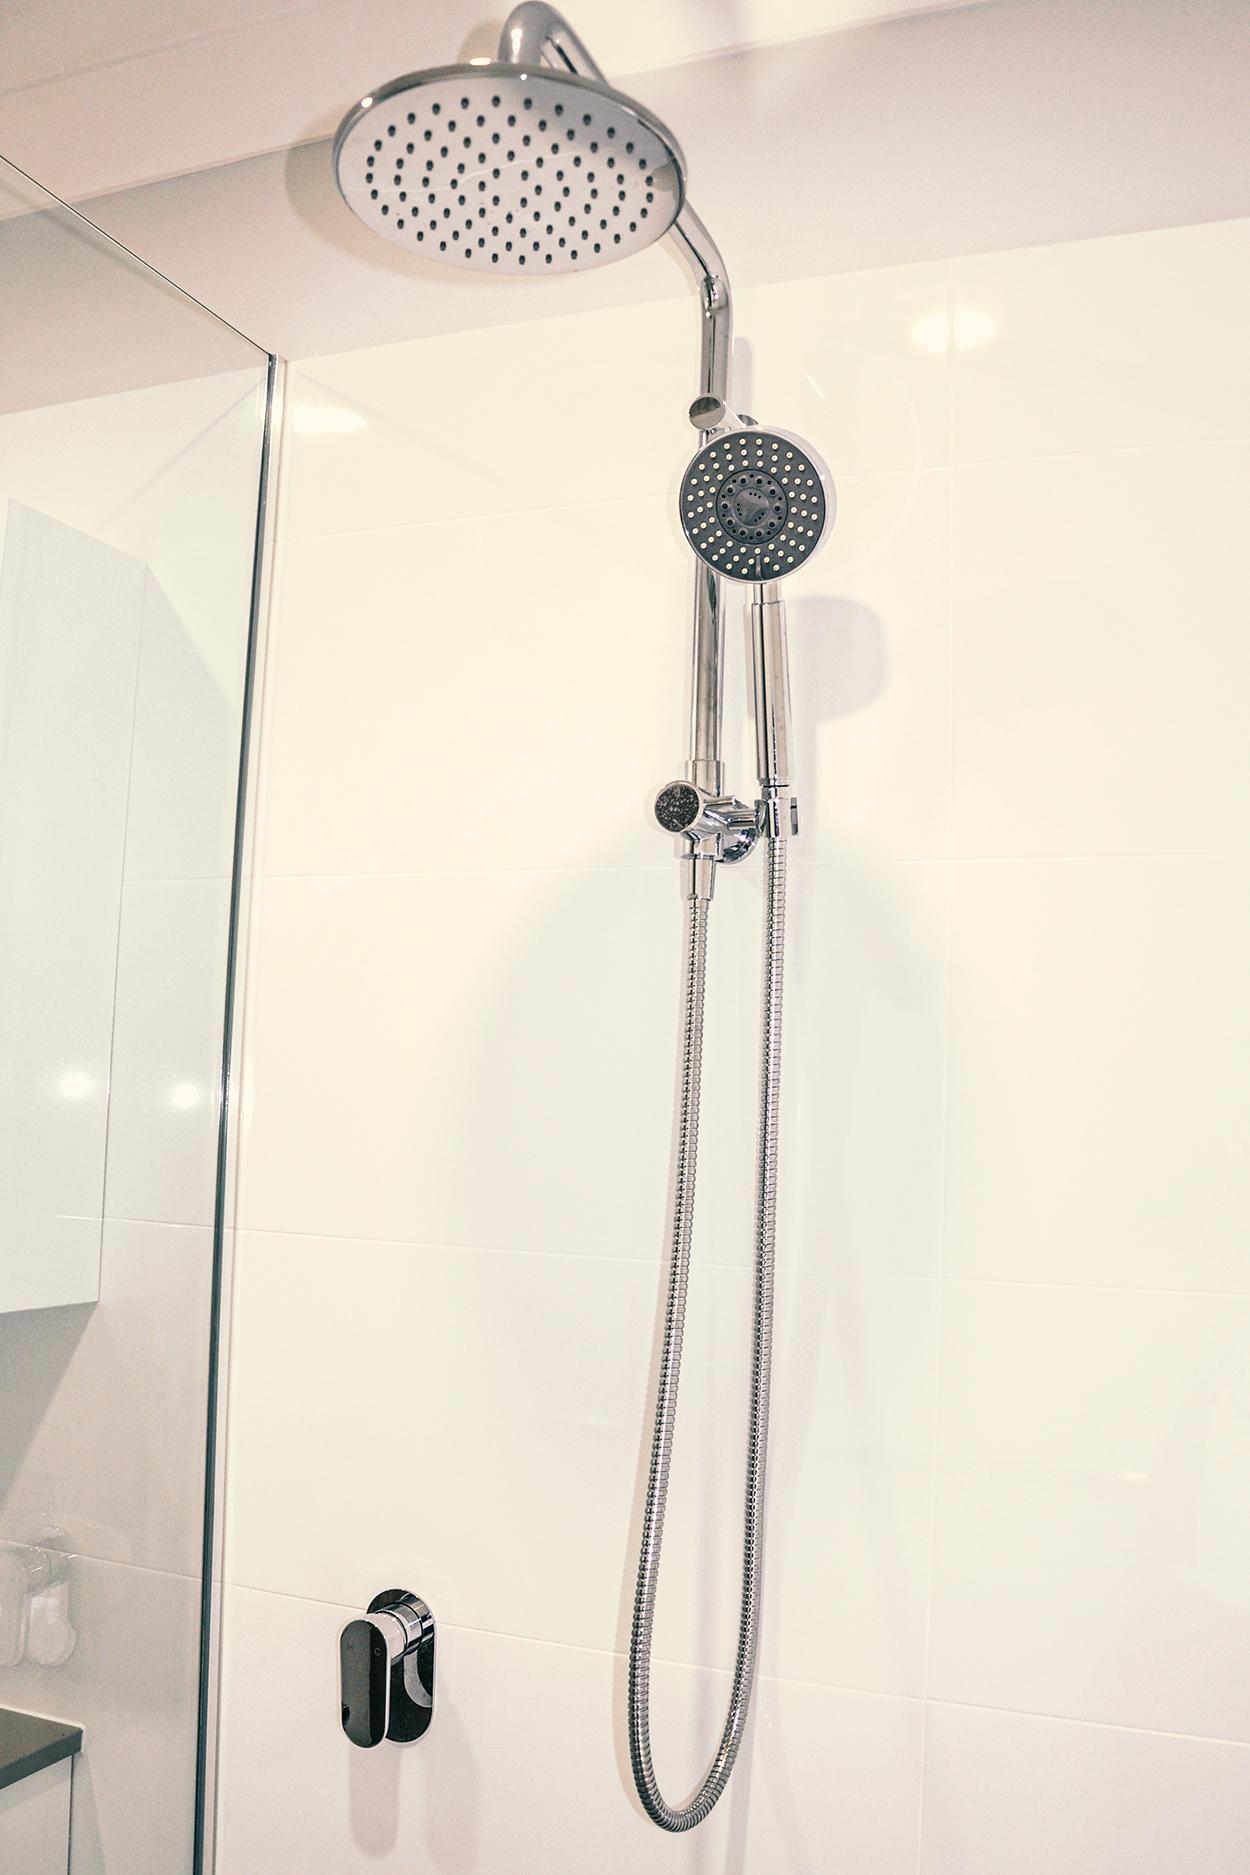 high quality shower rail in perth